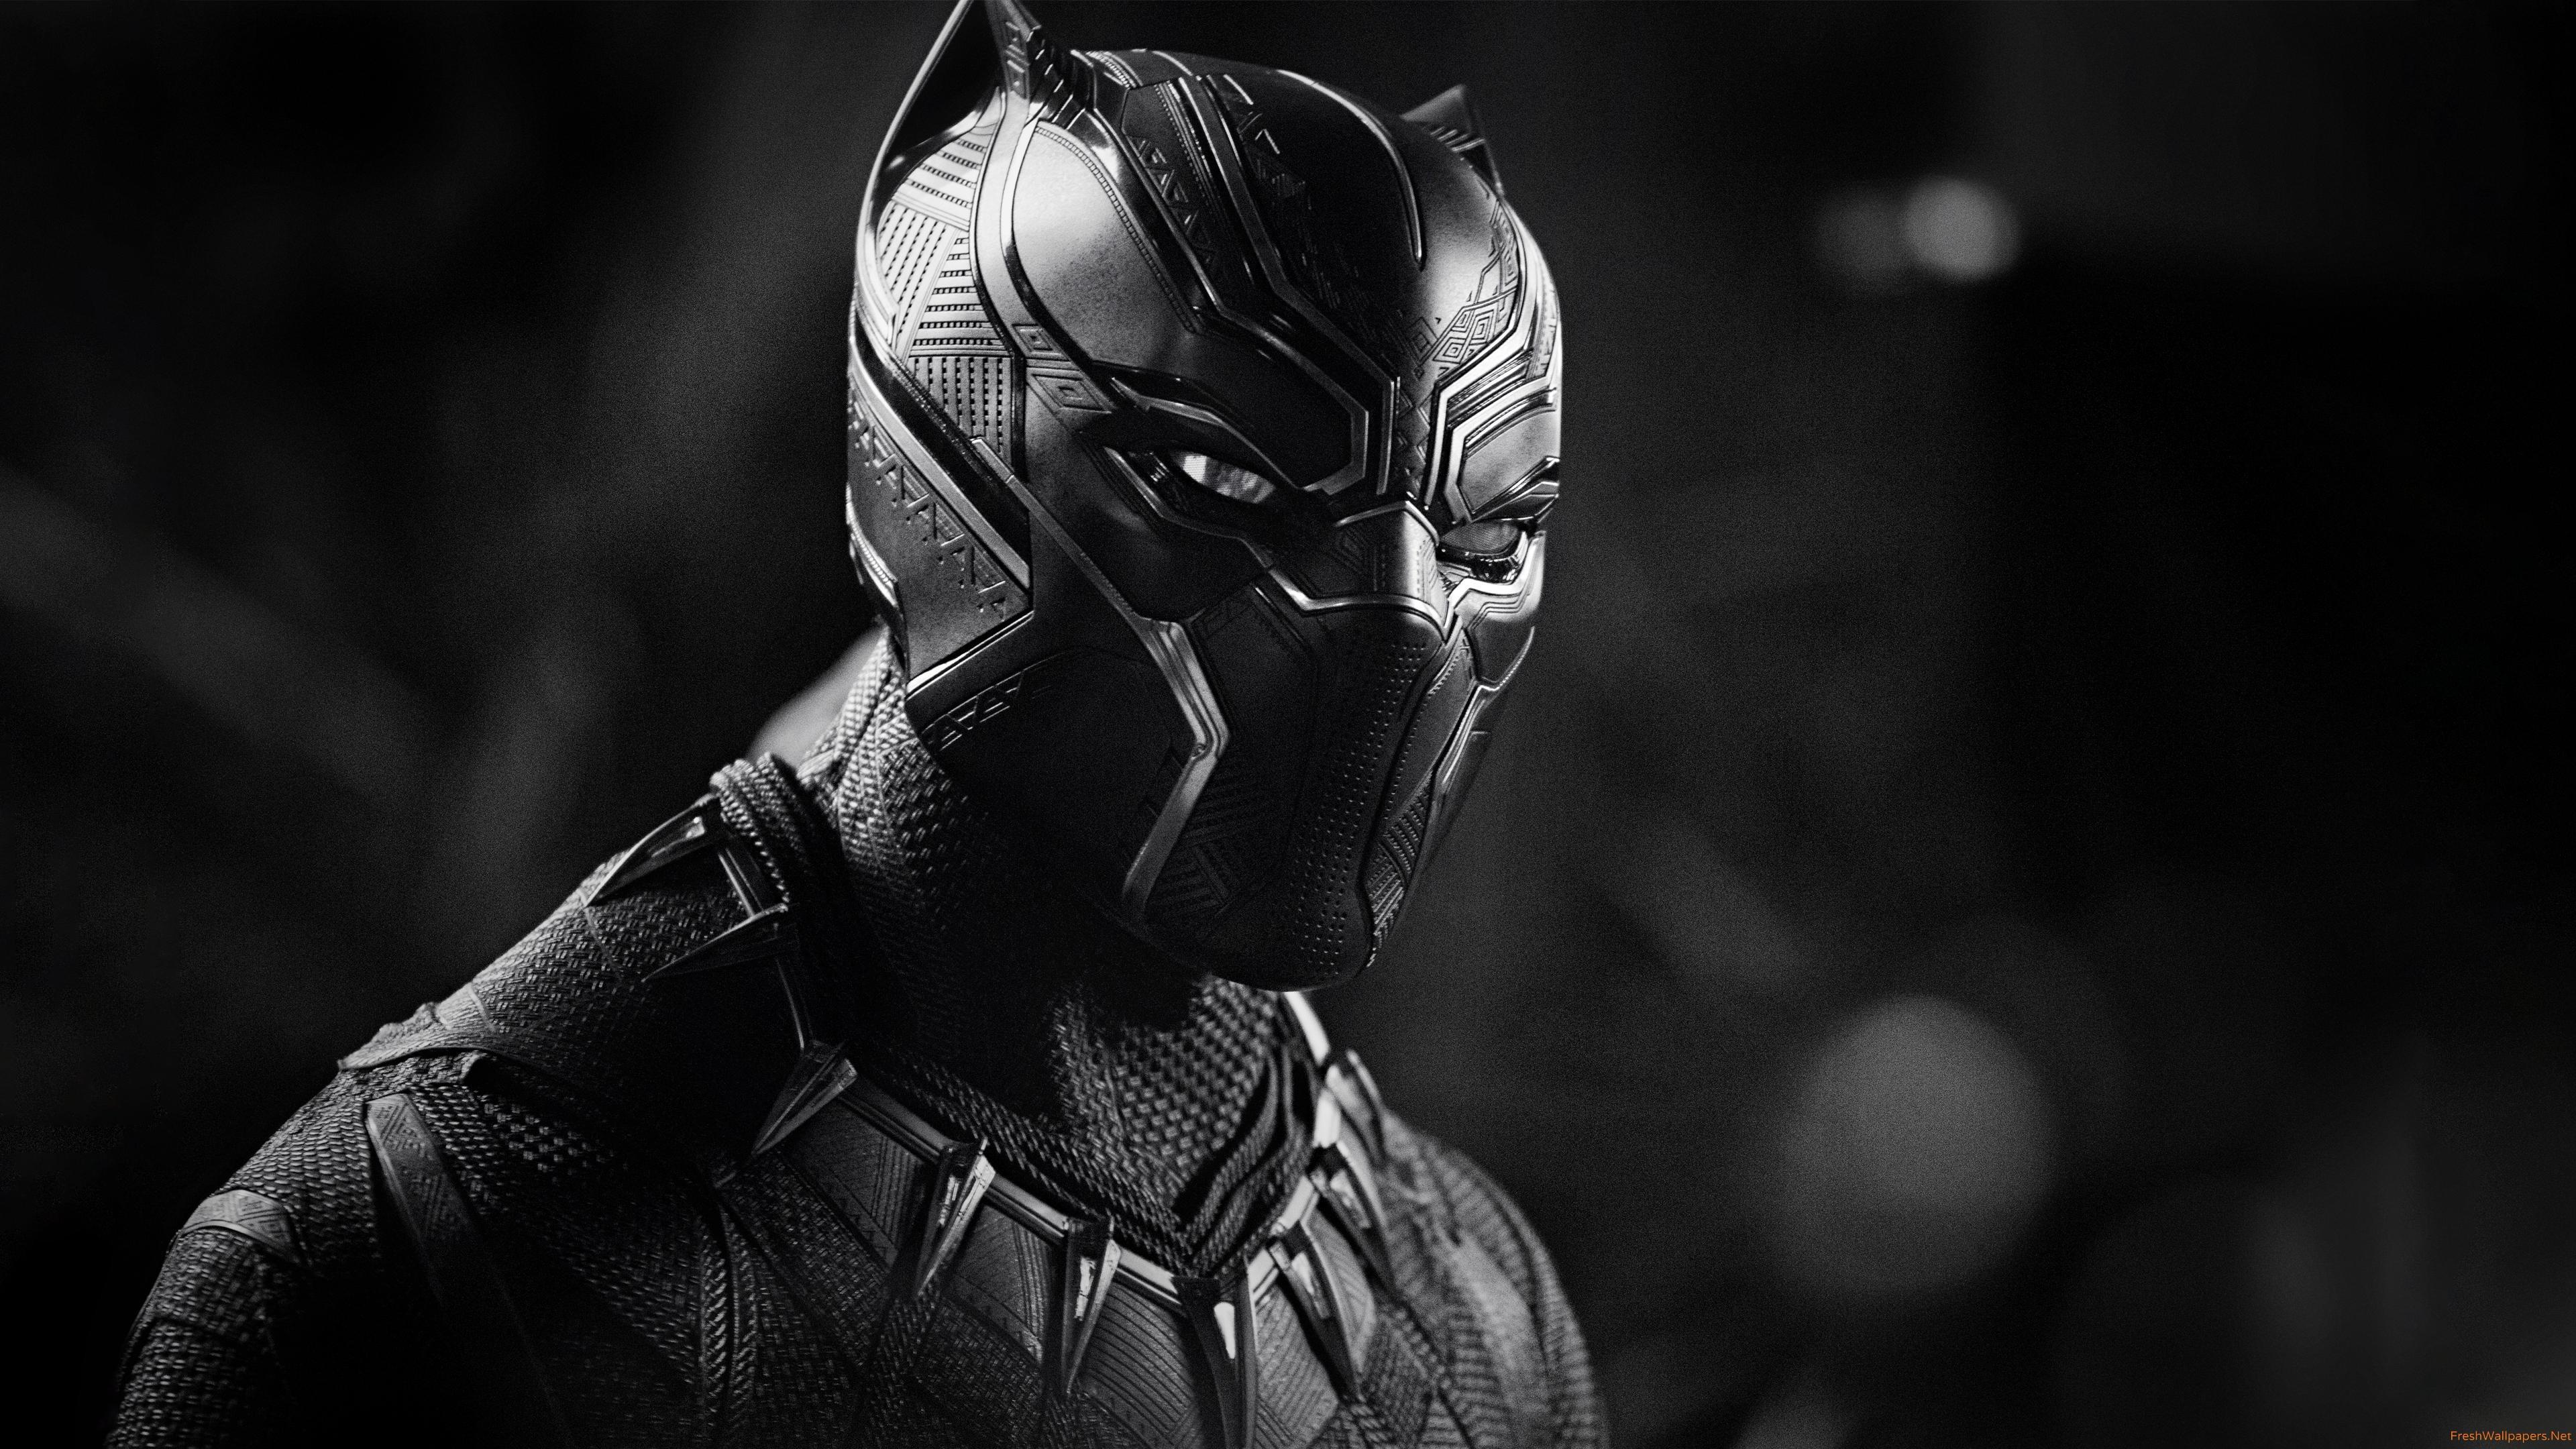 Black Panther 4K wallpapers Freshwallpapers 3840x2160